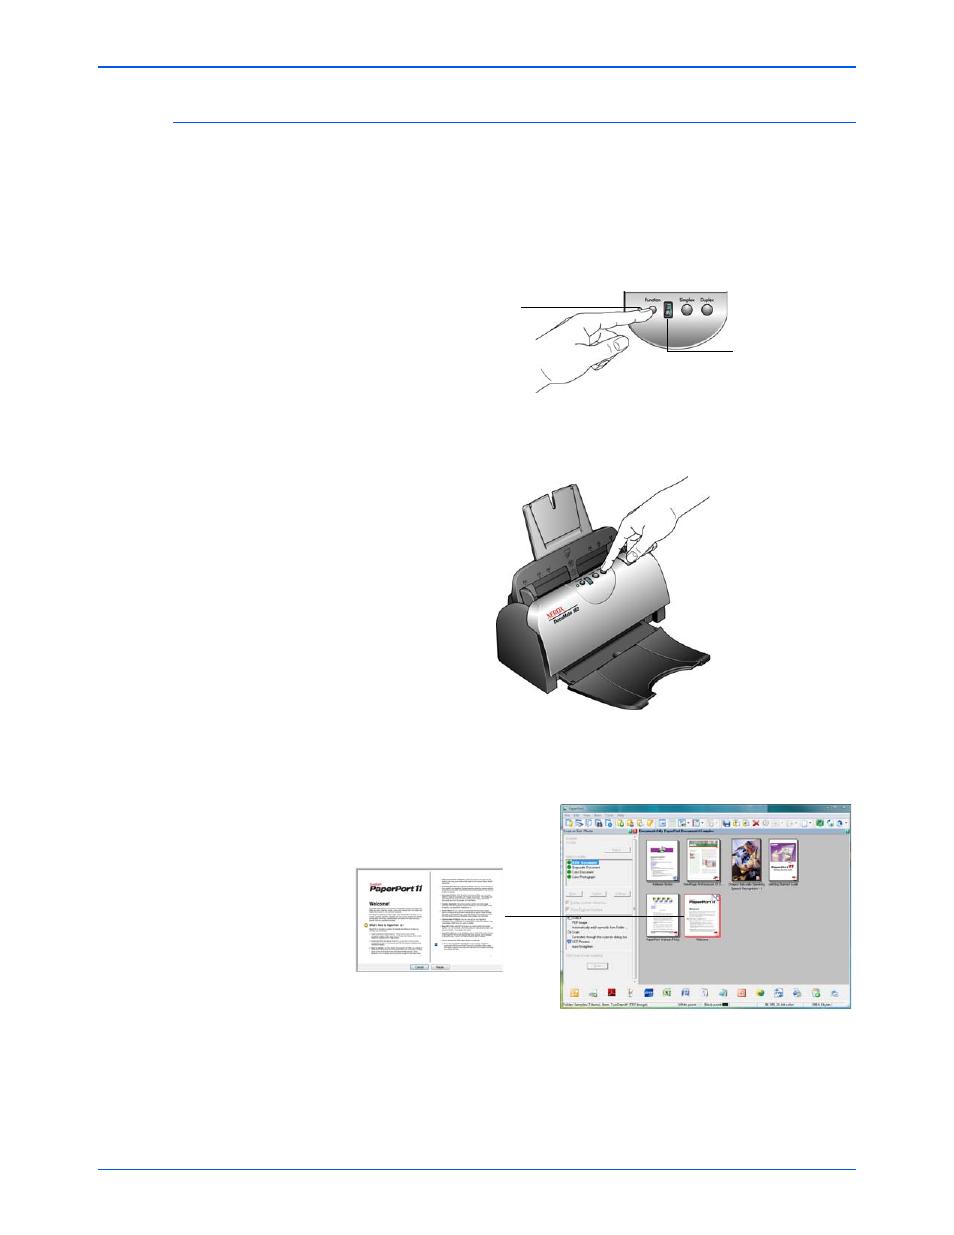 scan from the one touch scanner buttons xerox documate 162 user rh manualsdir com Xerox DocuMate 152 Software Xerox DocuMate Driver